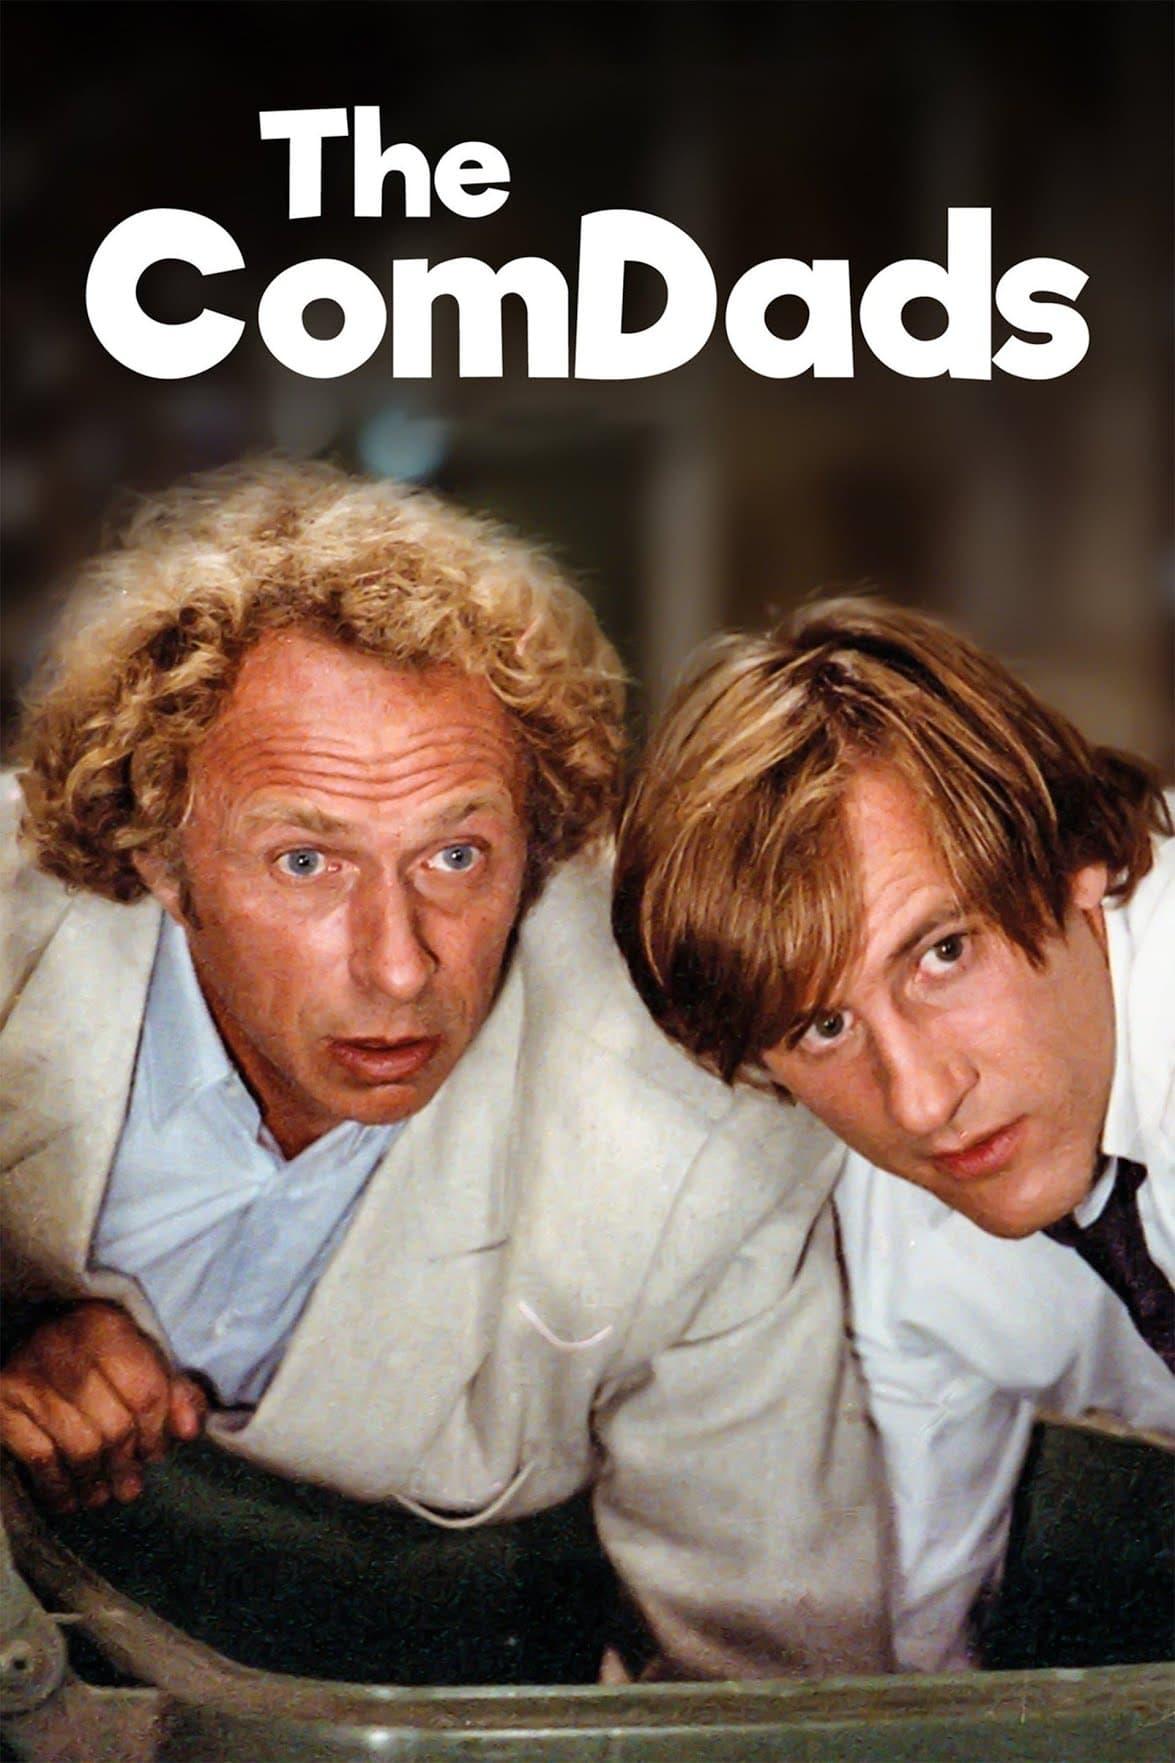 The ComDads